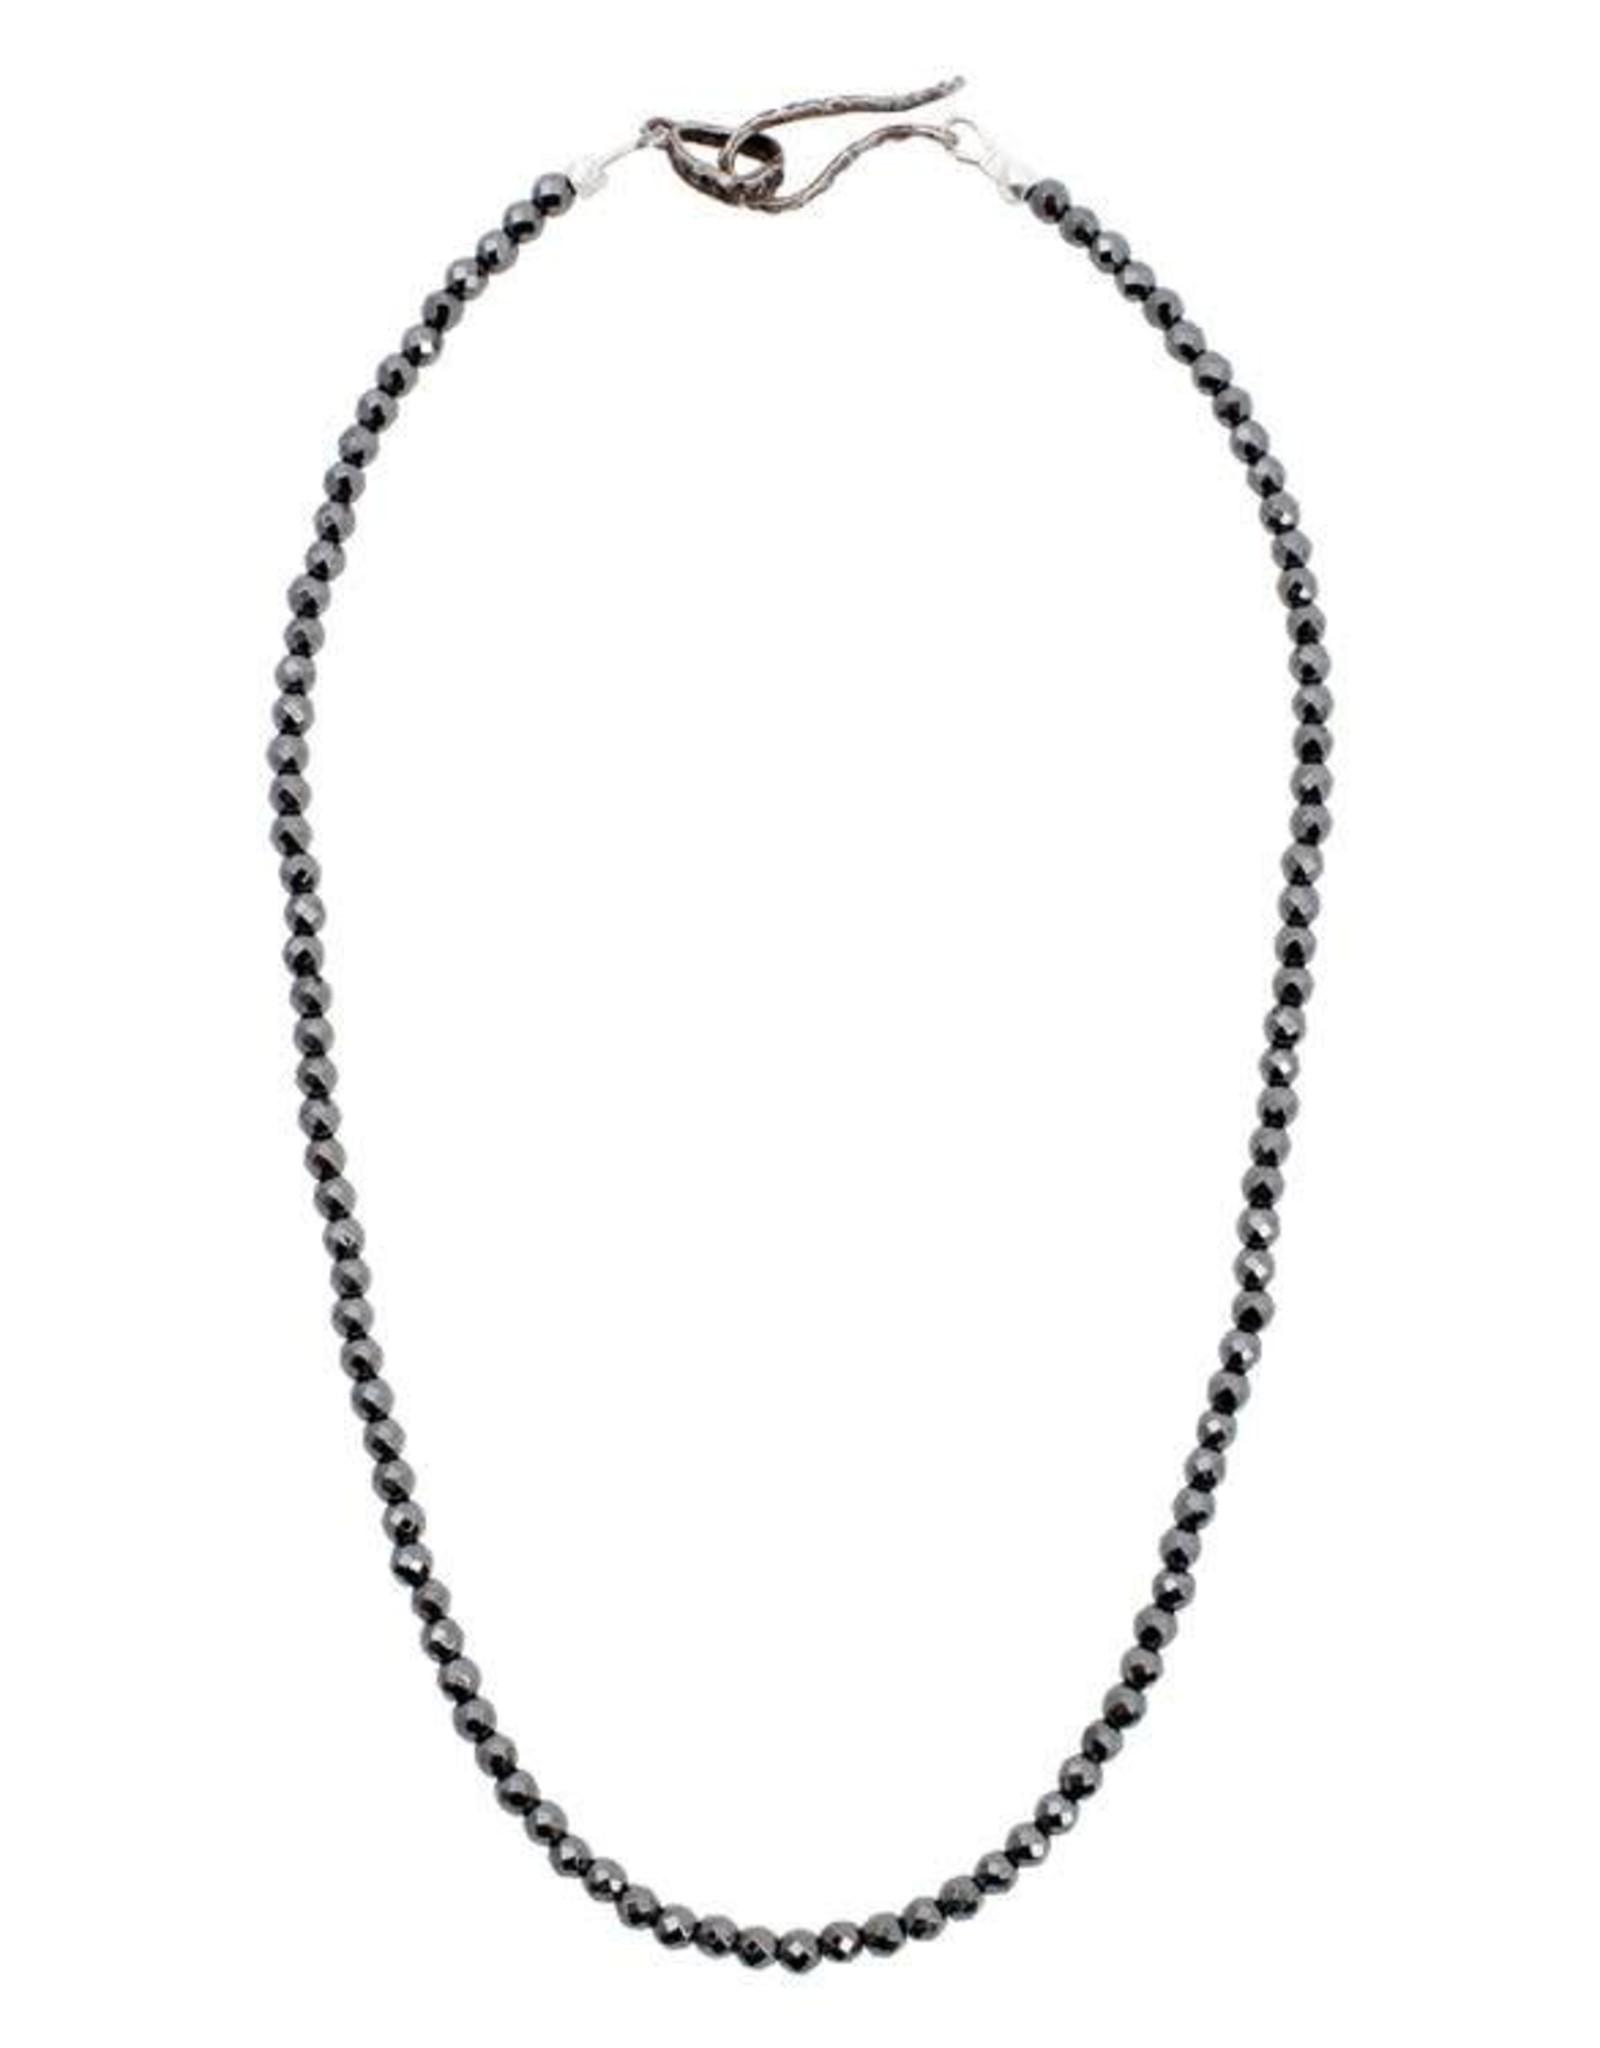 Lauren Wolf Jewelry Strand Necklace - Large Hematite